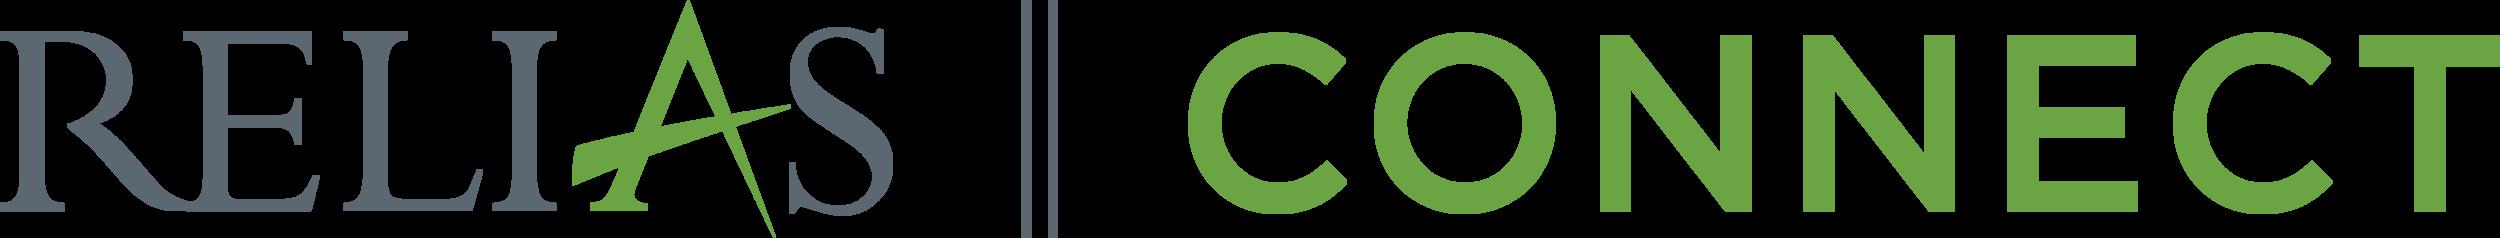 logo_relias_connect_horizontal.png